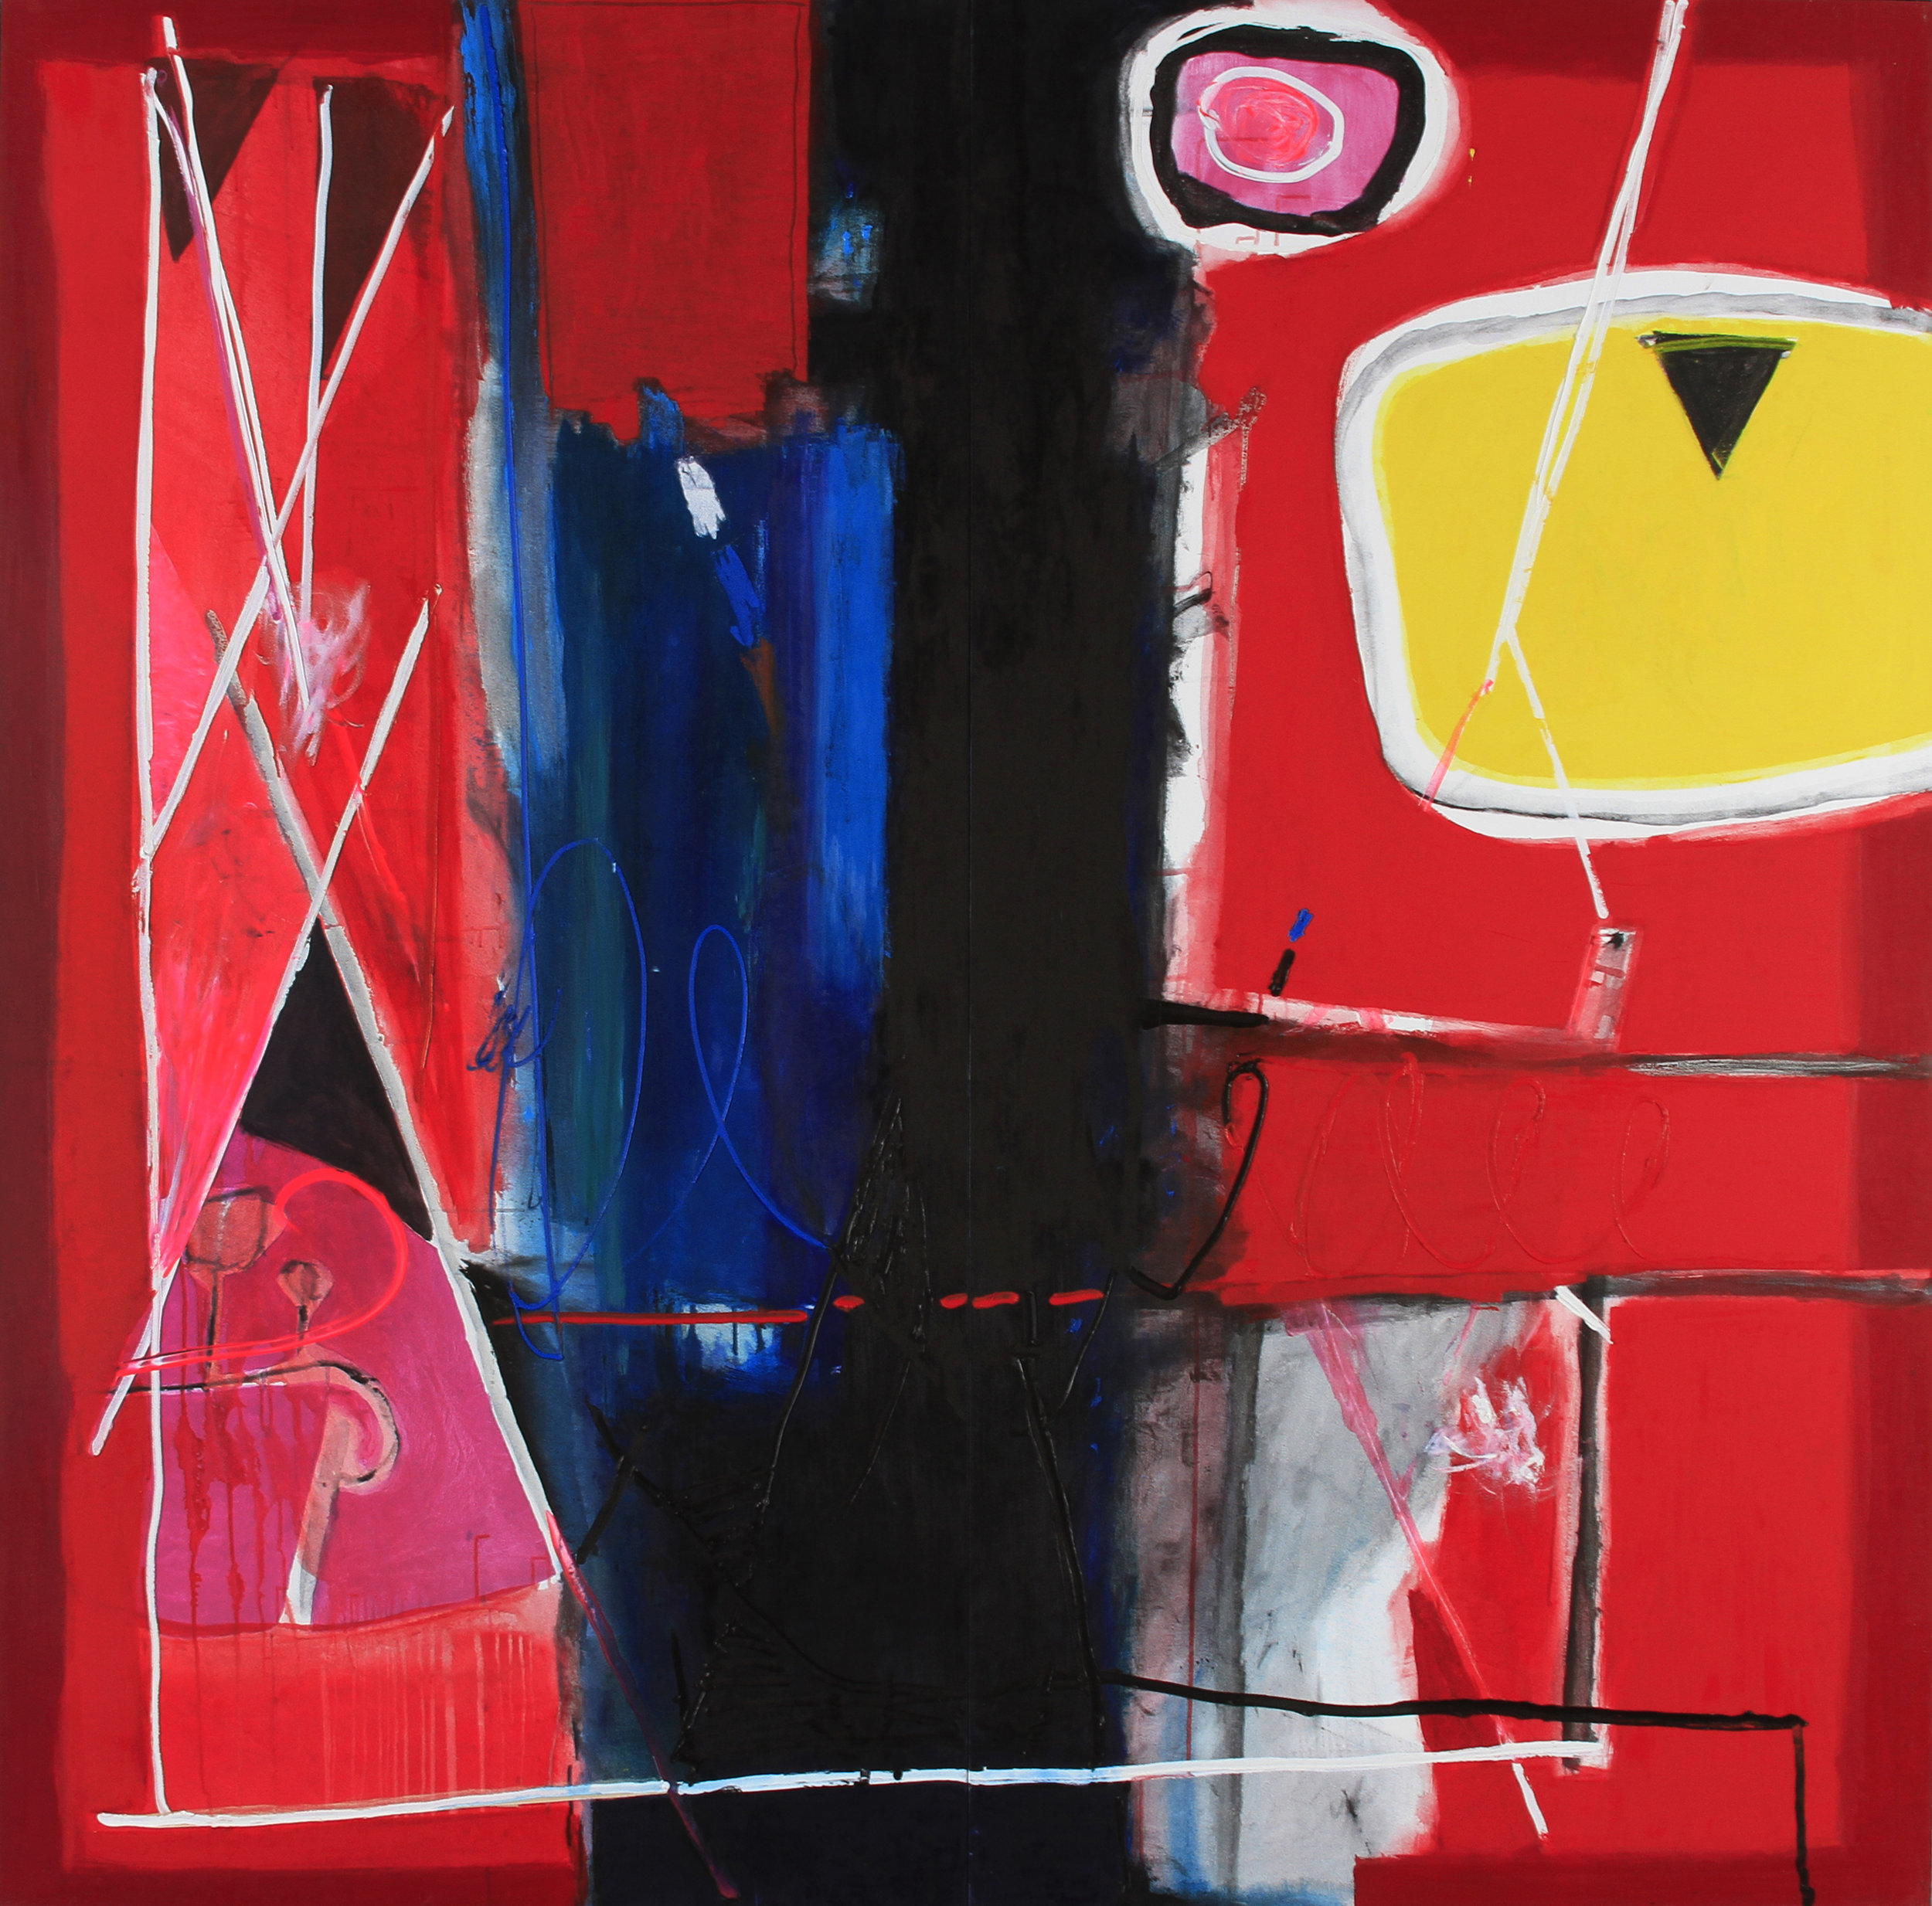 Gustavo Ramos Rivera, Al Mal Tiempo Buena Cara (A Good Face for Bad Times), 2015, oil on canvas, 84 x 84 inches